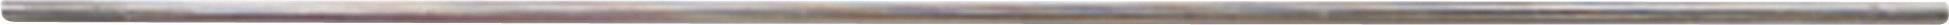 Wolframová elektróda Lorch, Ø 1,6 mm, 10 ks